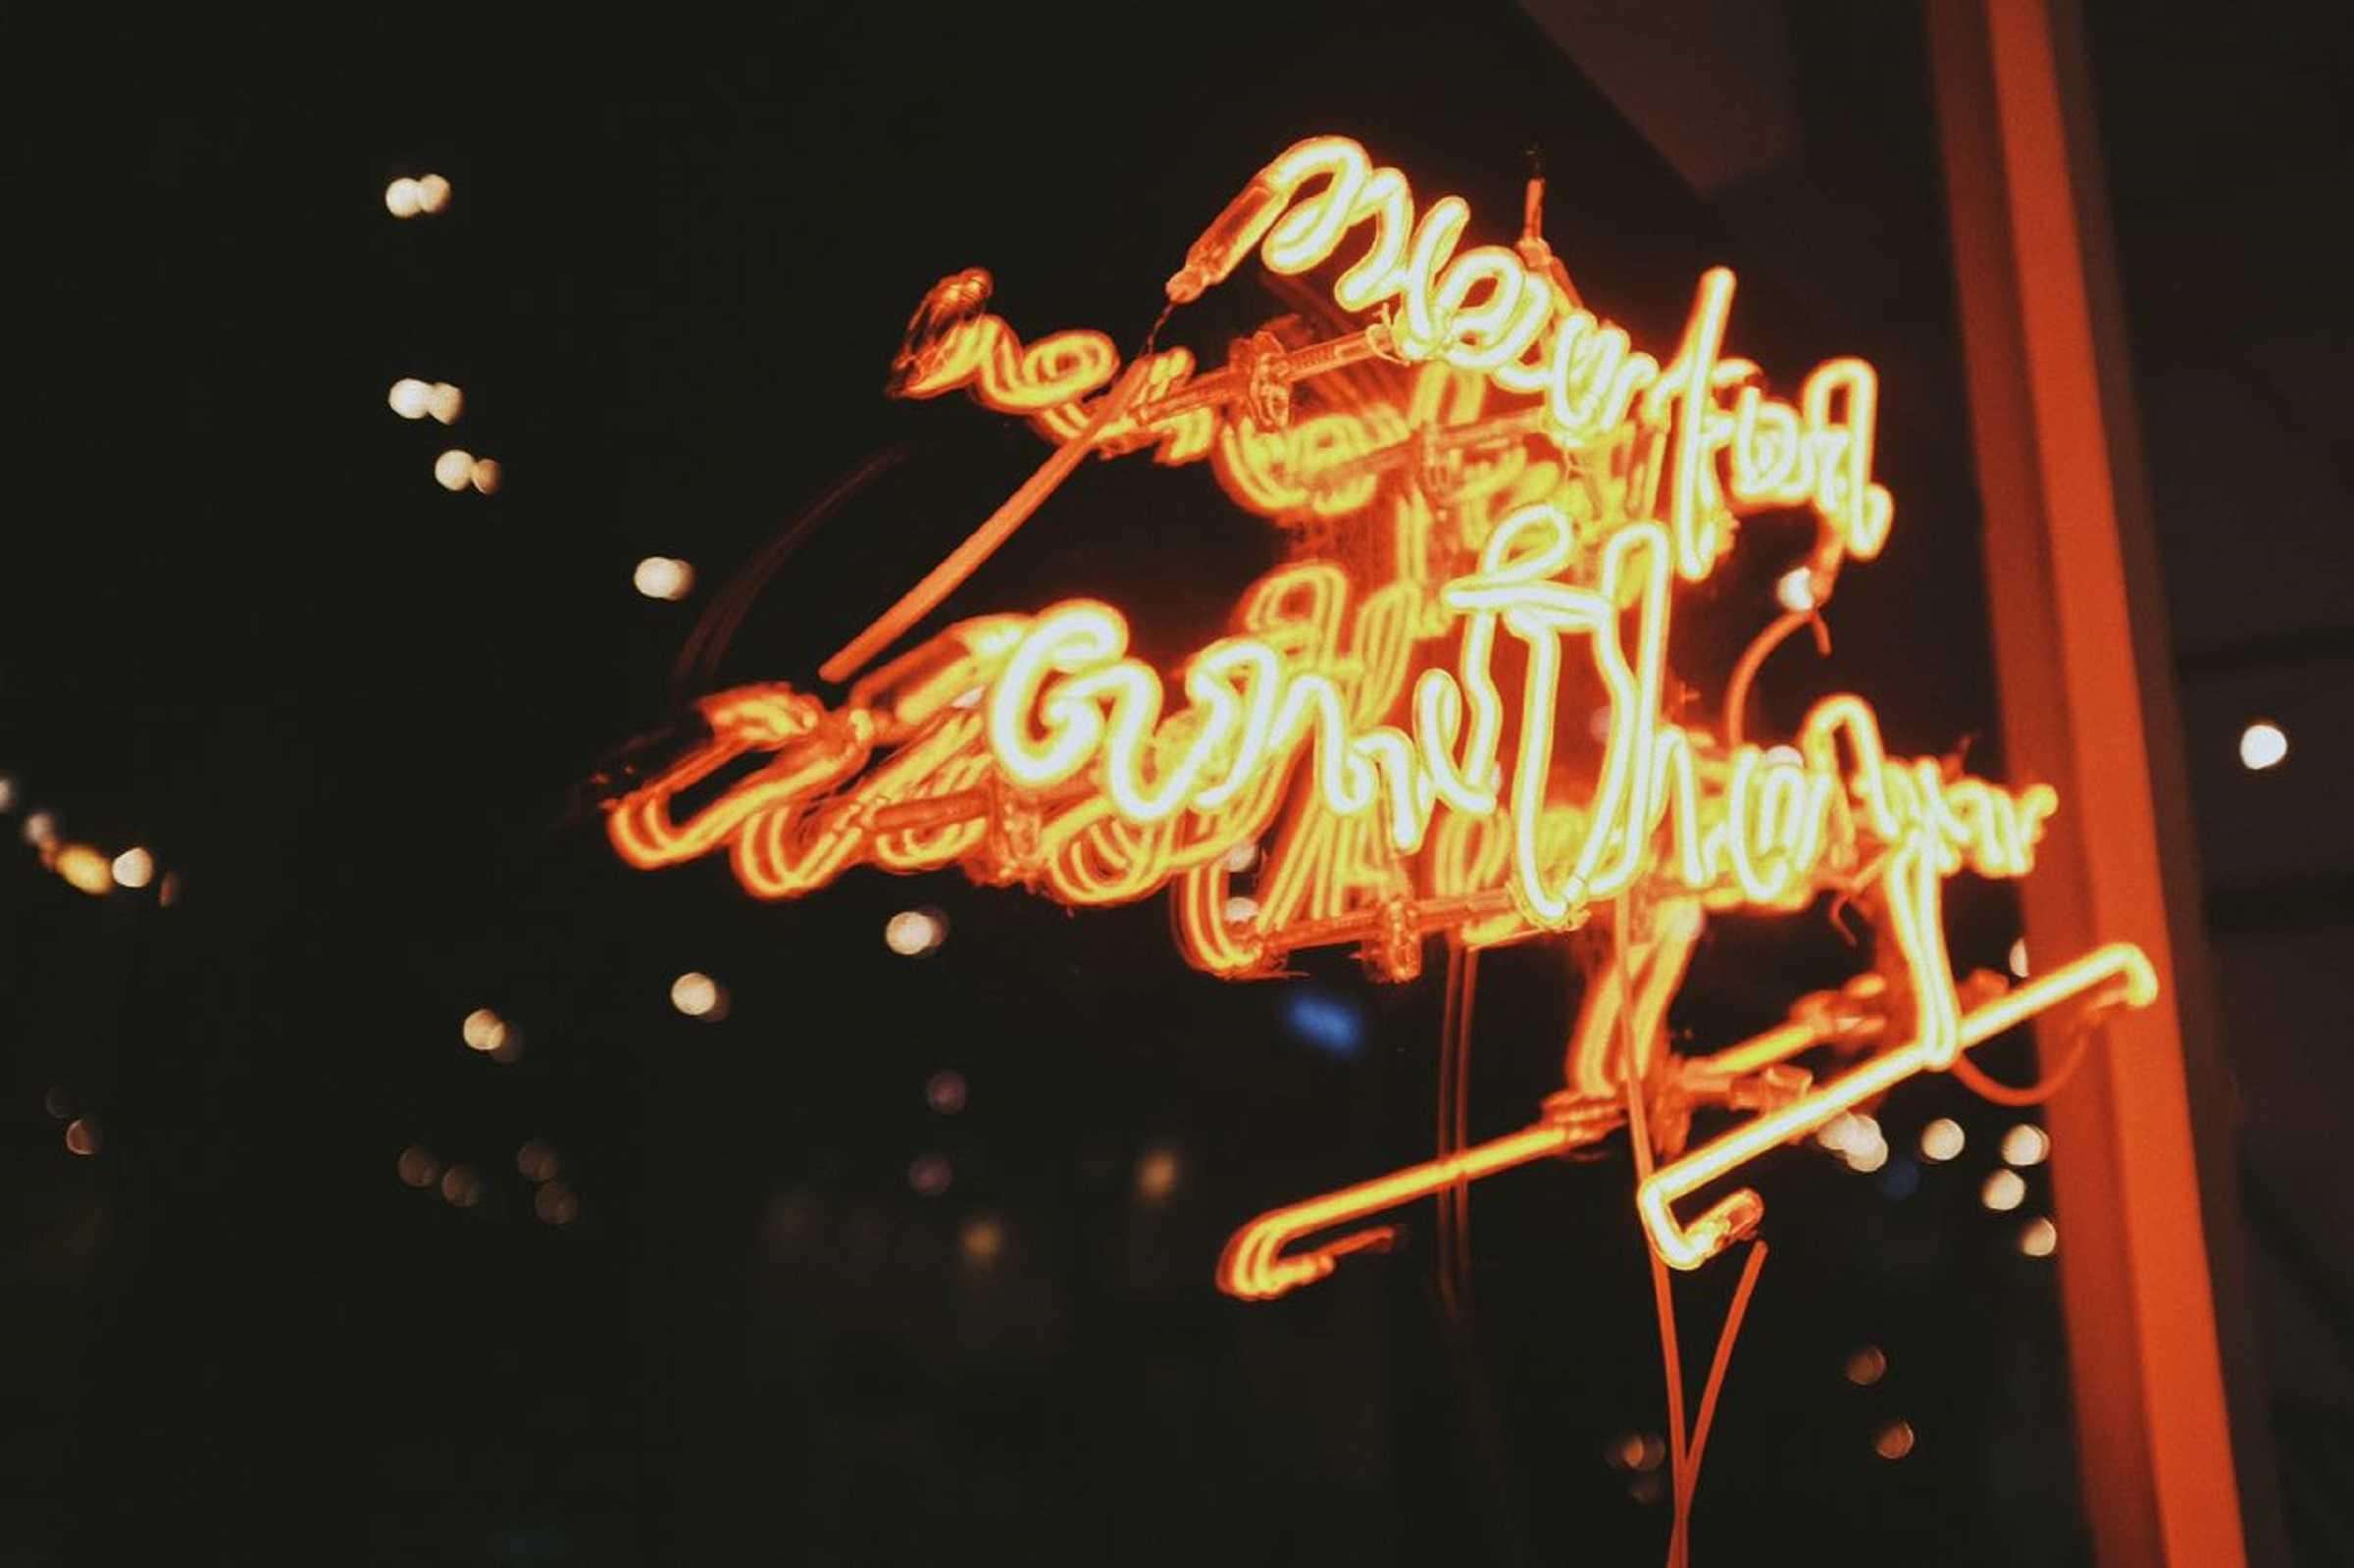 Arcon - Interior & Furniture Contractor Atipattra Booth Jl. Bsd Grand Boulevard No.1, Pagedangan, Tangerang, Banten 15339, Indonesia Jl. Bsd Grand Boulevard No.1, Pagedangan, Tangerang, Banten 15339, Indonesia Arcon-Interior-Furniture-Contractor-Atipattra-Booth   69891